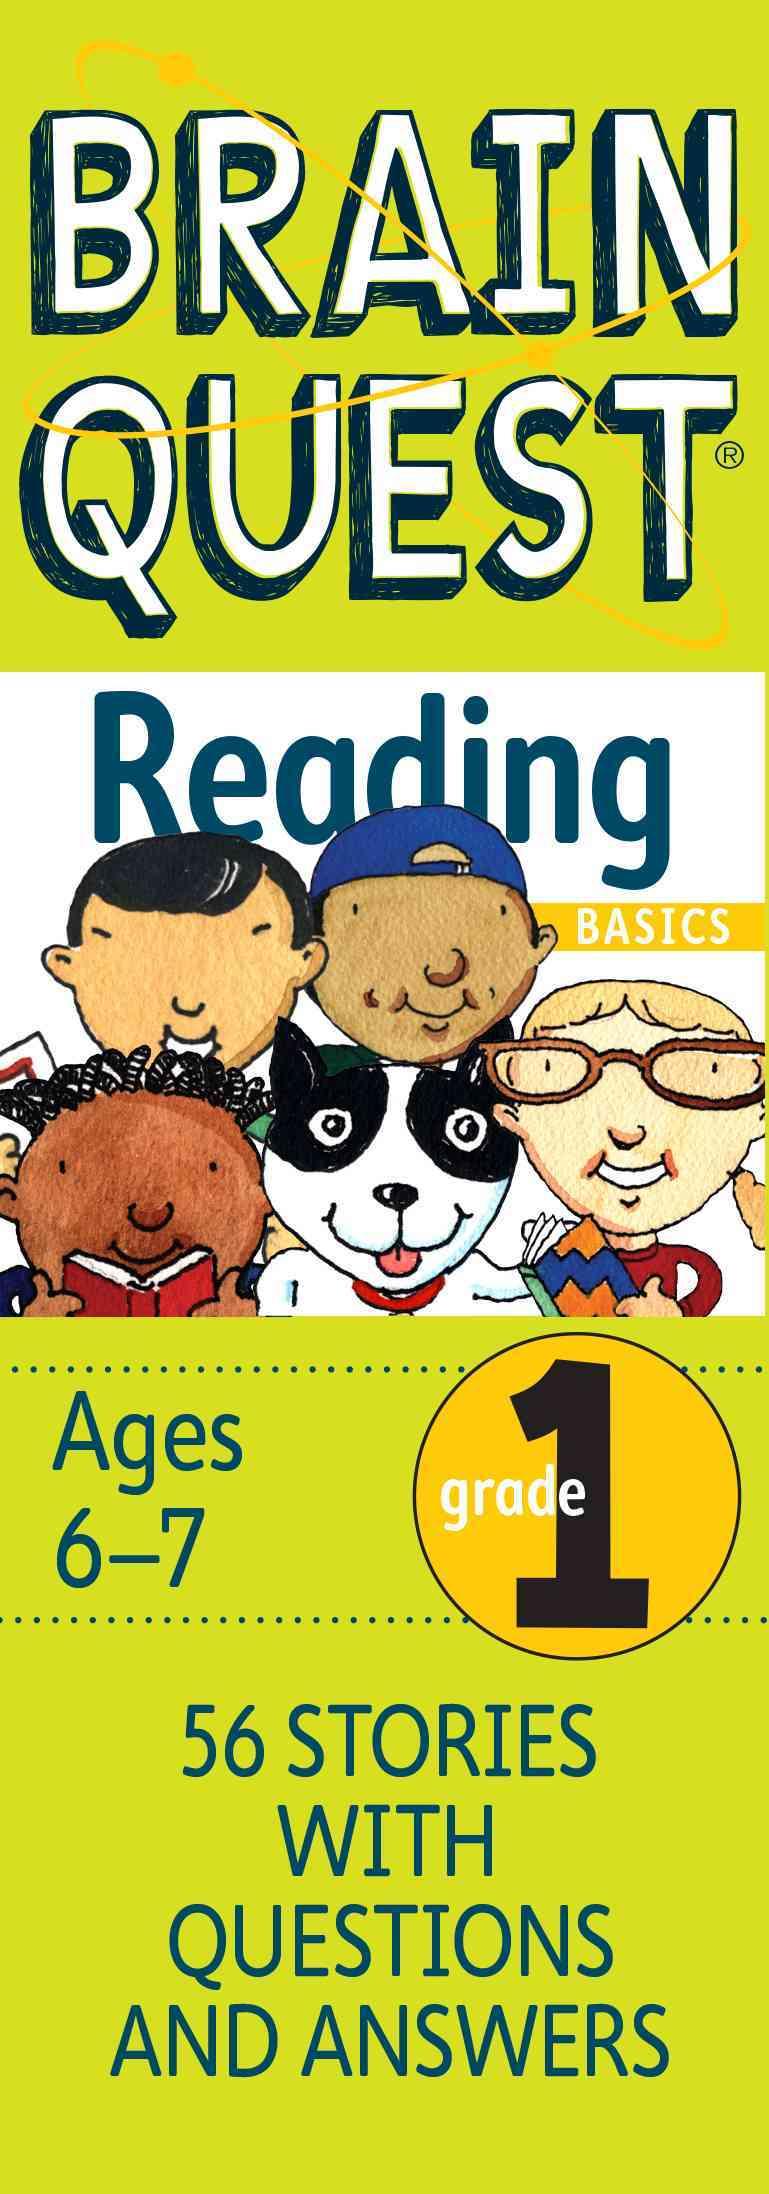 Brain Quest Grade 1 Reading Basics